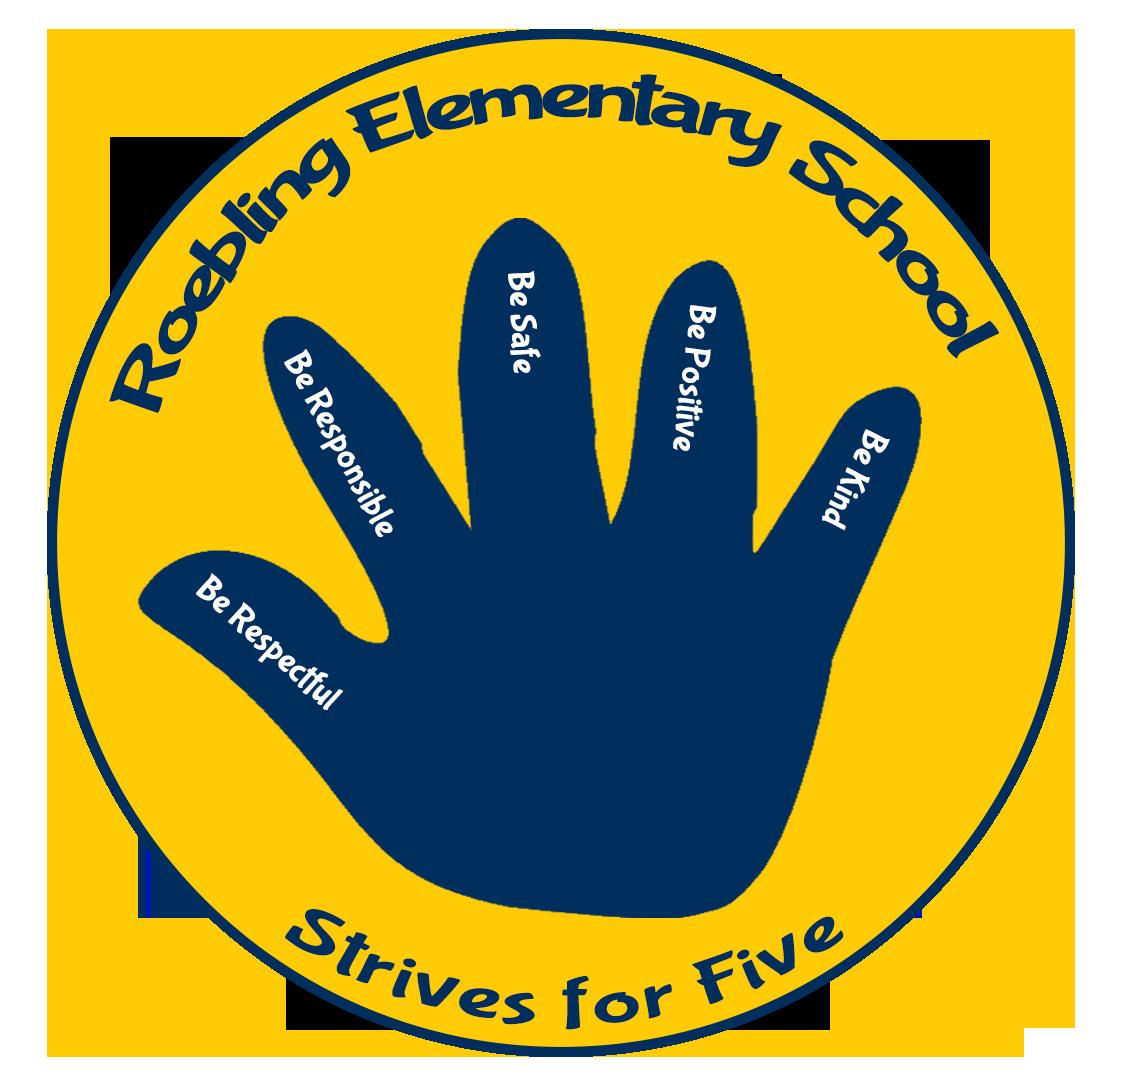 Roebling Logo 2020 - Strive for Five